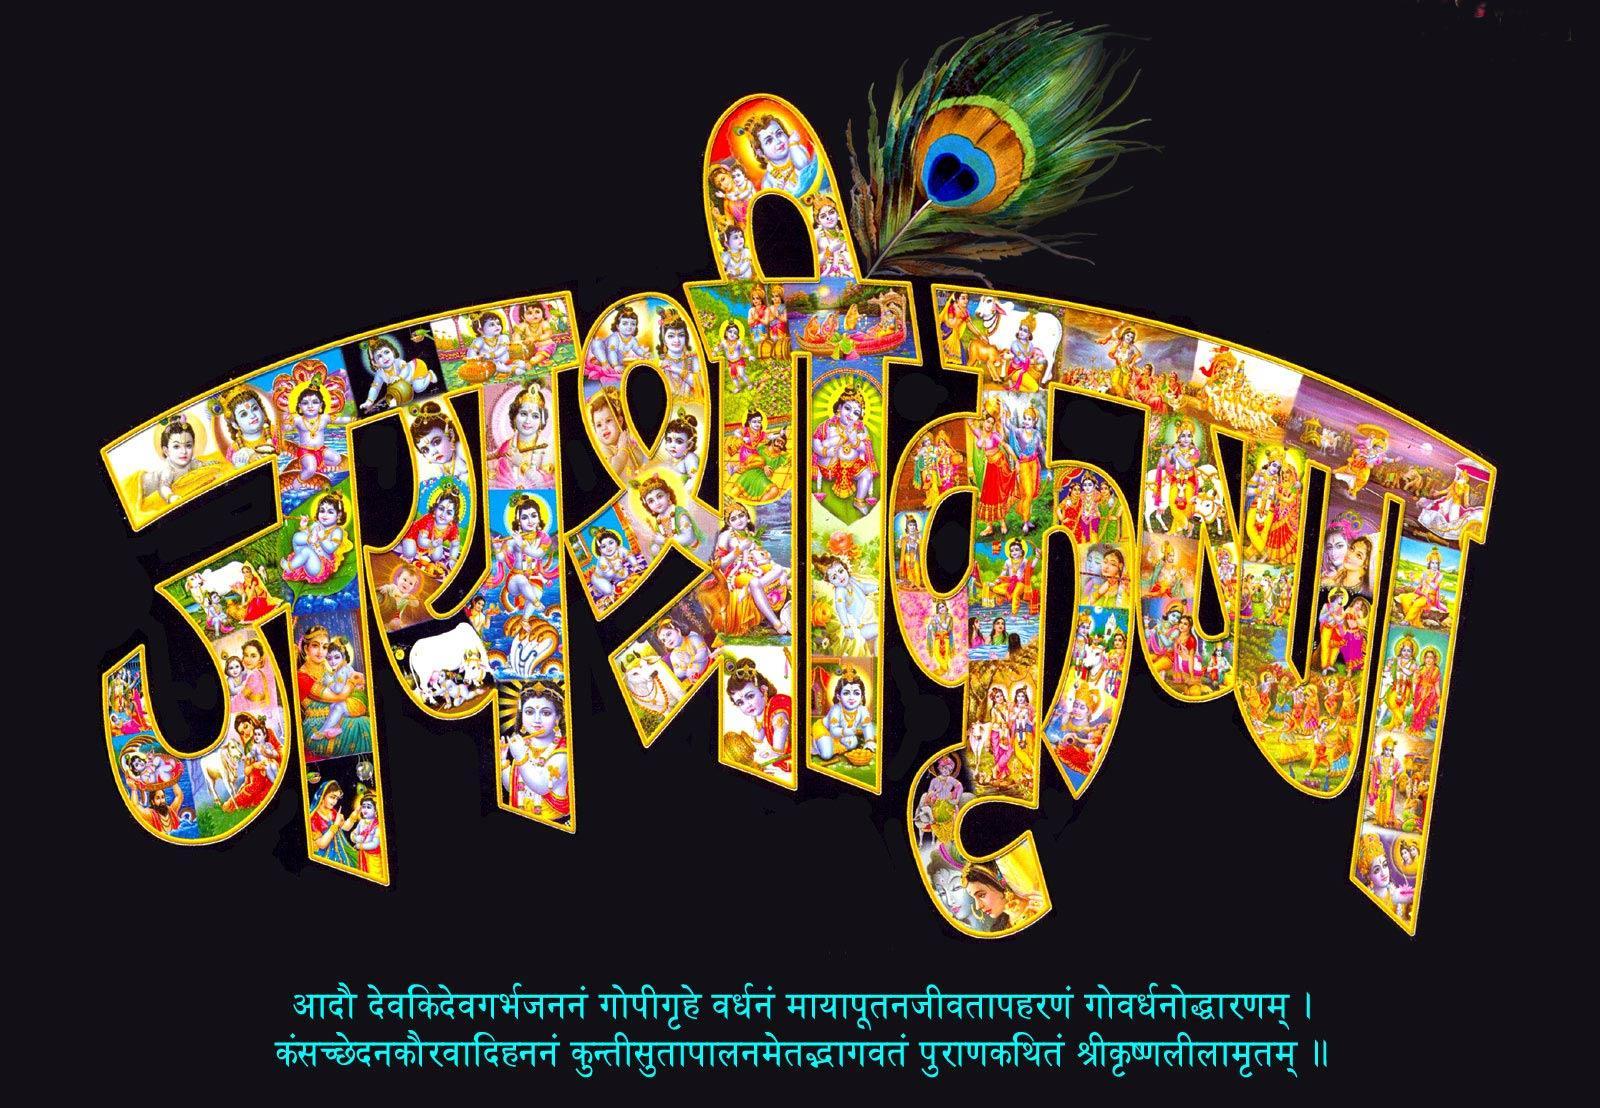 Download Jai Shree Krishna Janmashtami Wallpapers For Your Mobile